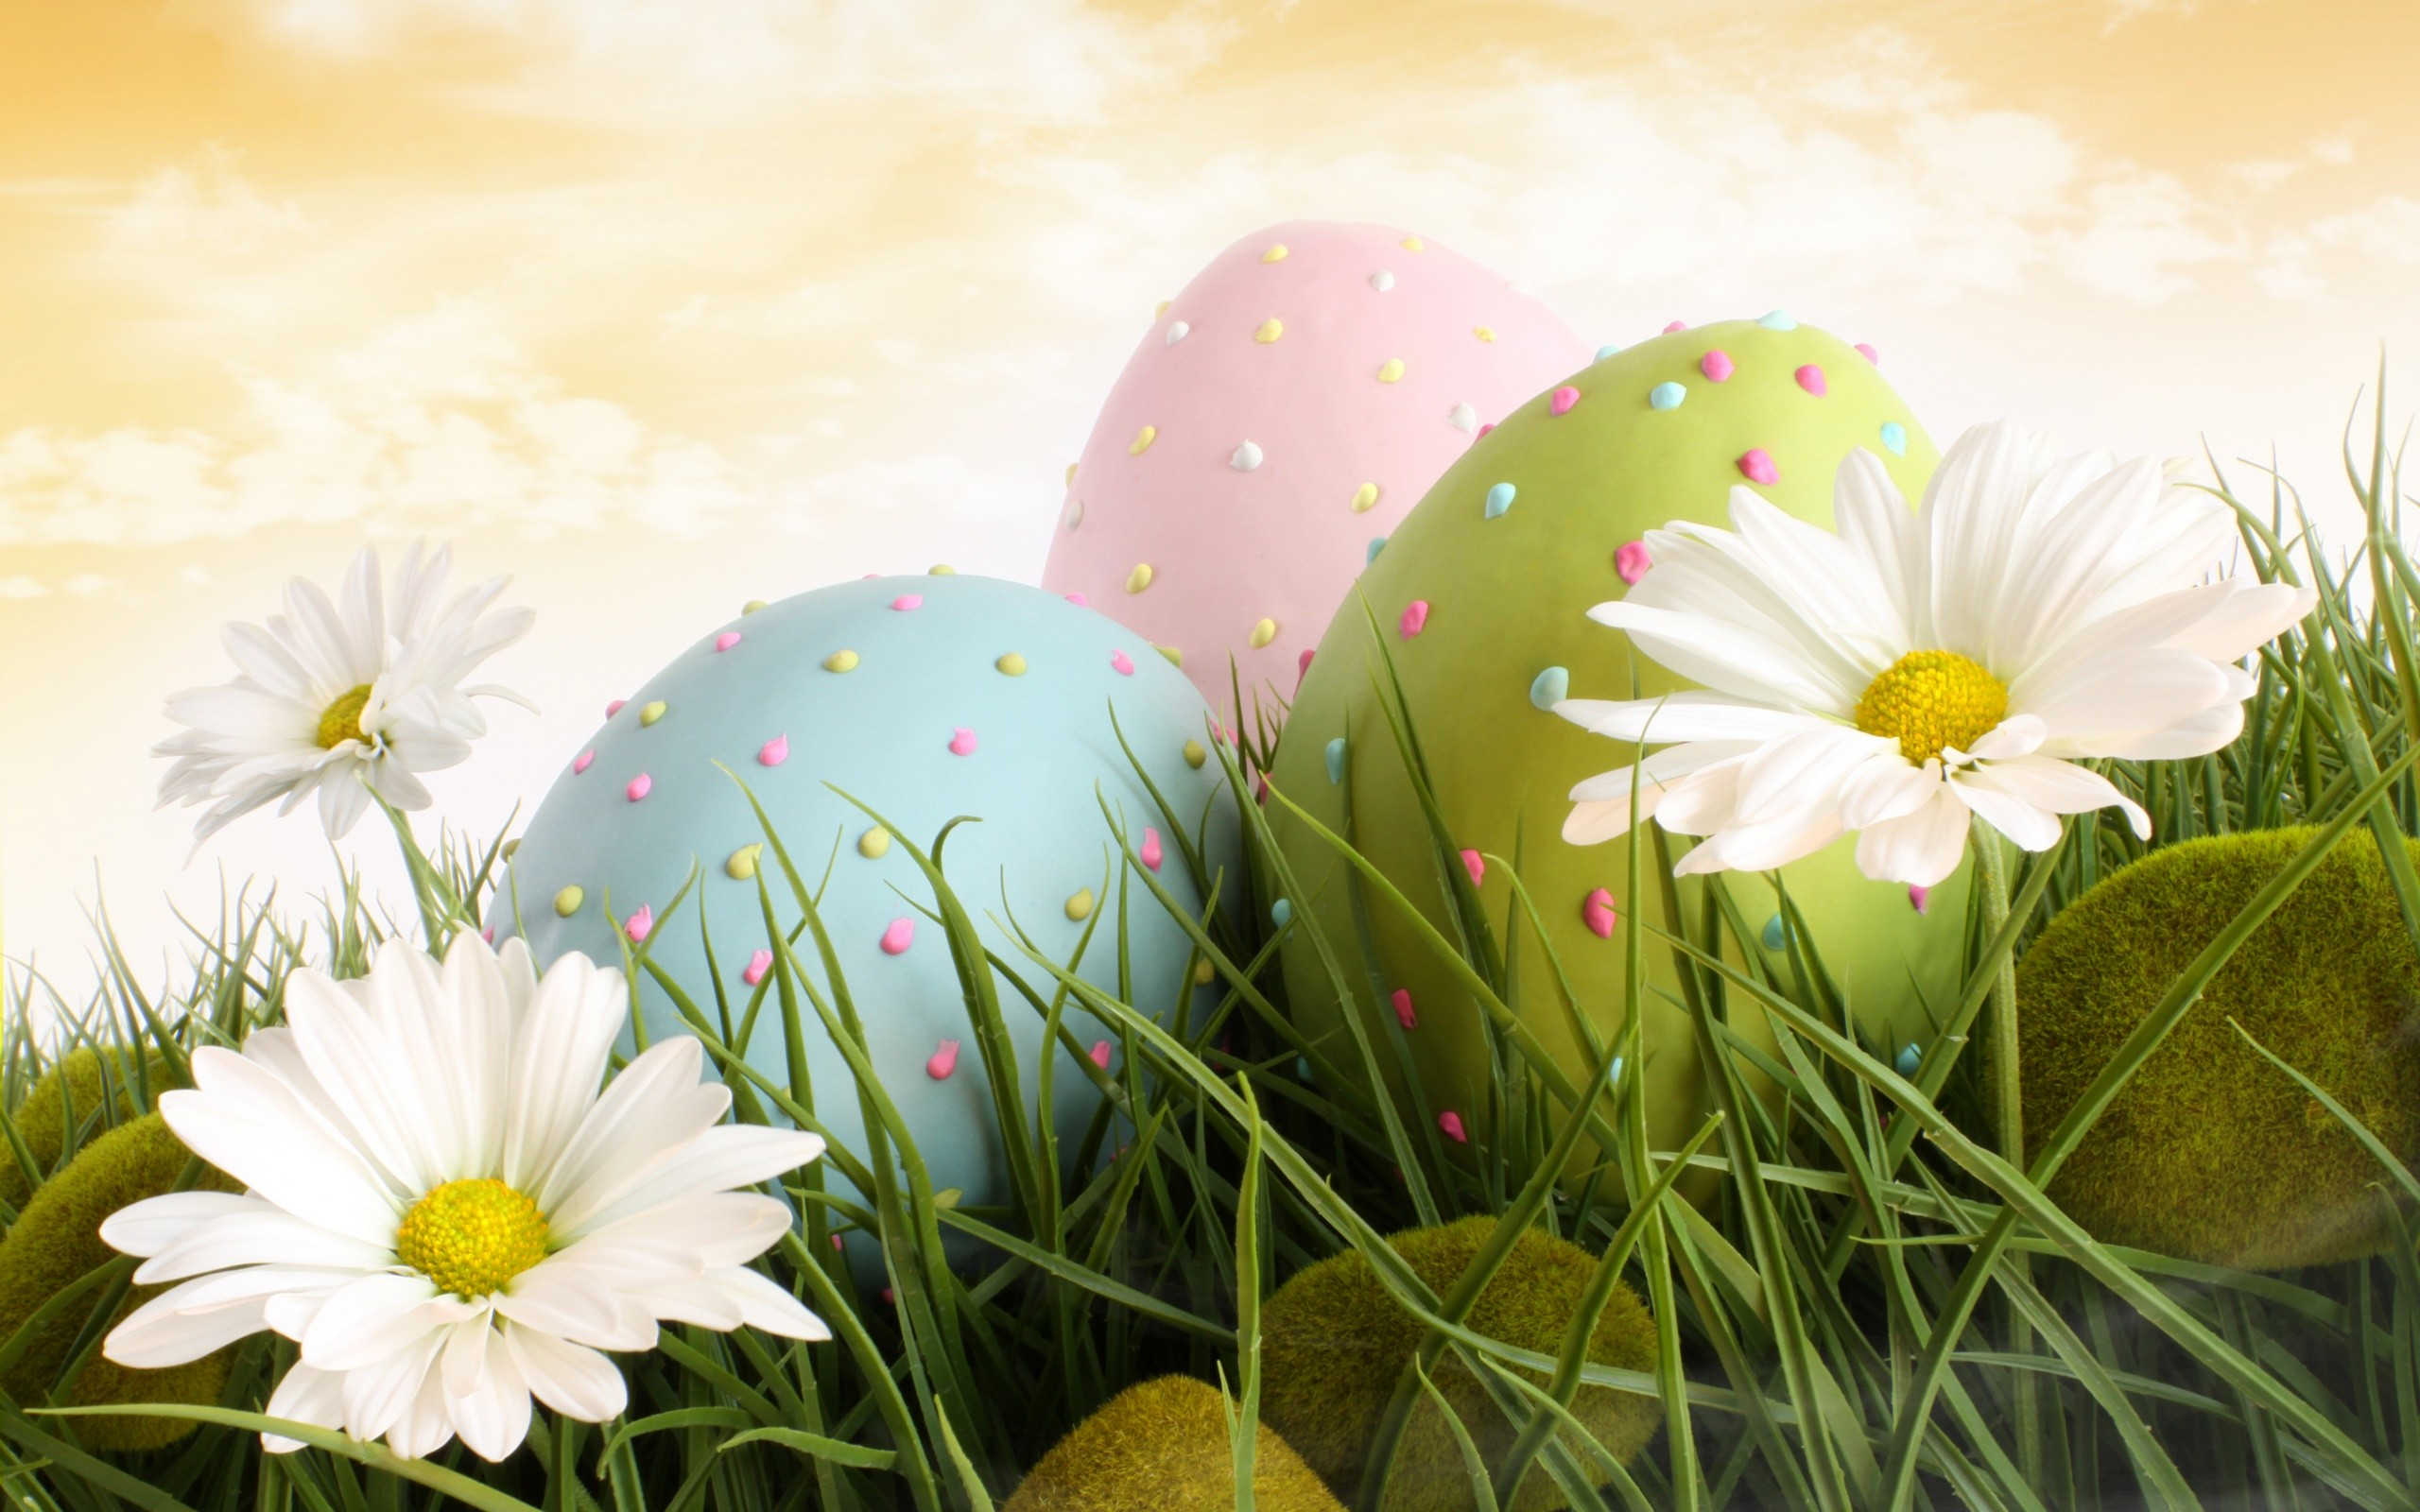 HD Bunnies And Easter Wallpapers Desktop Backgrounds   Funmole